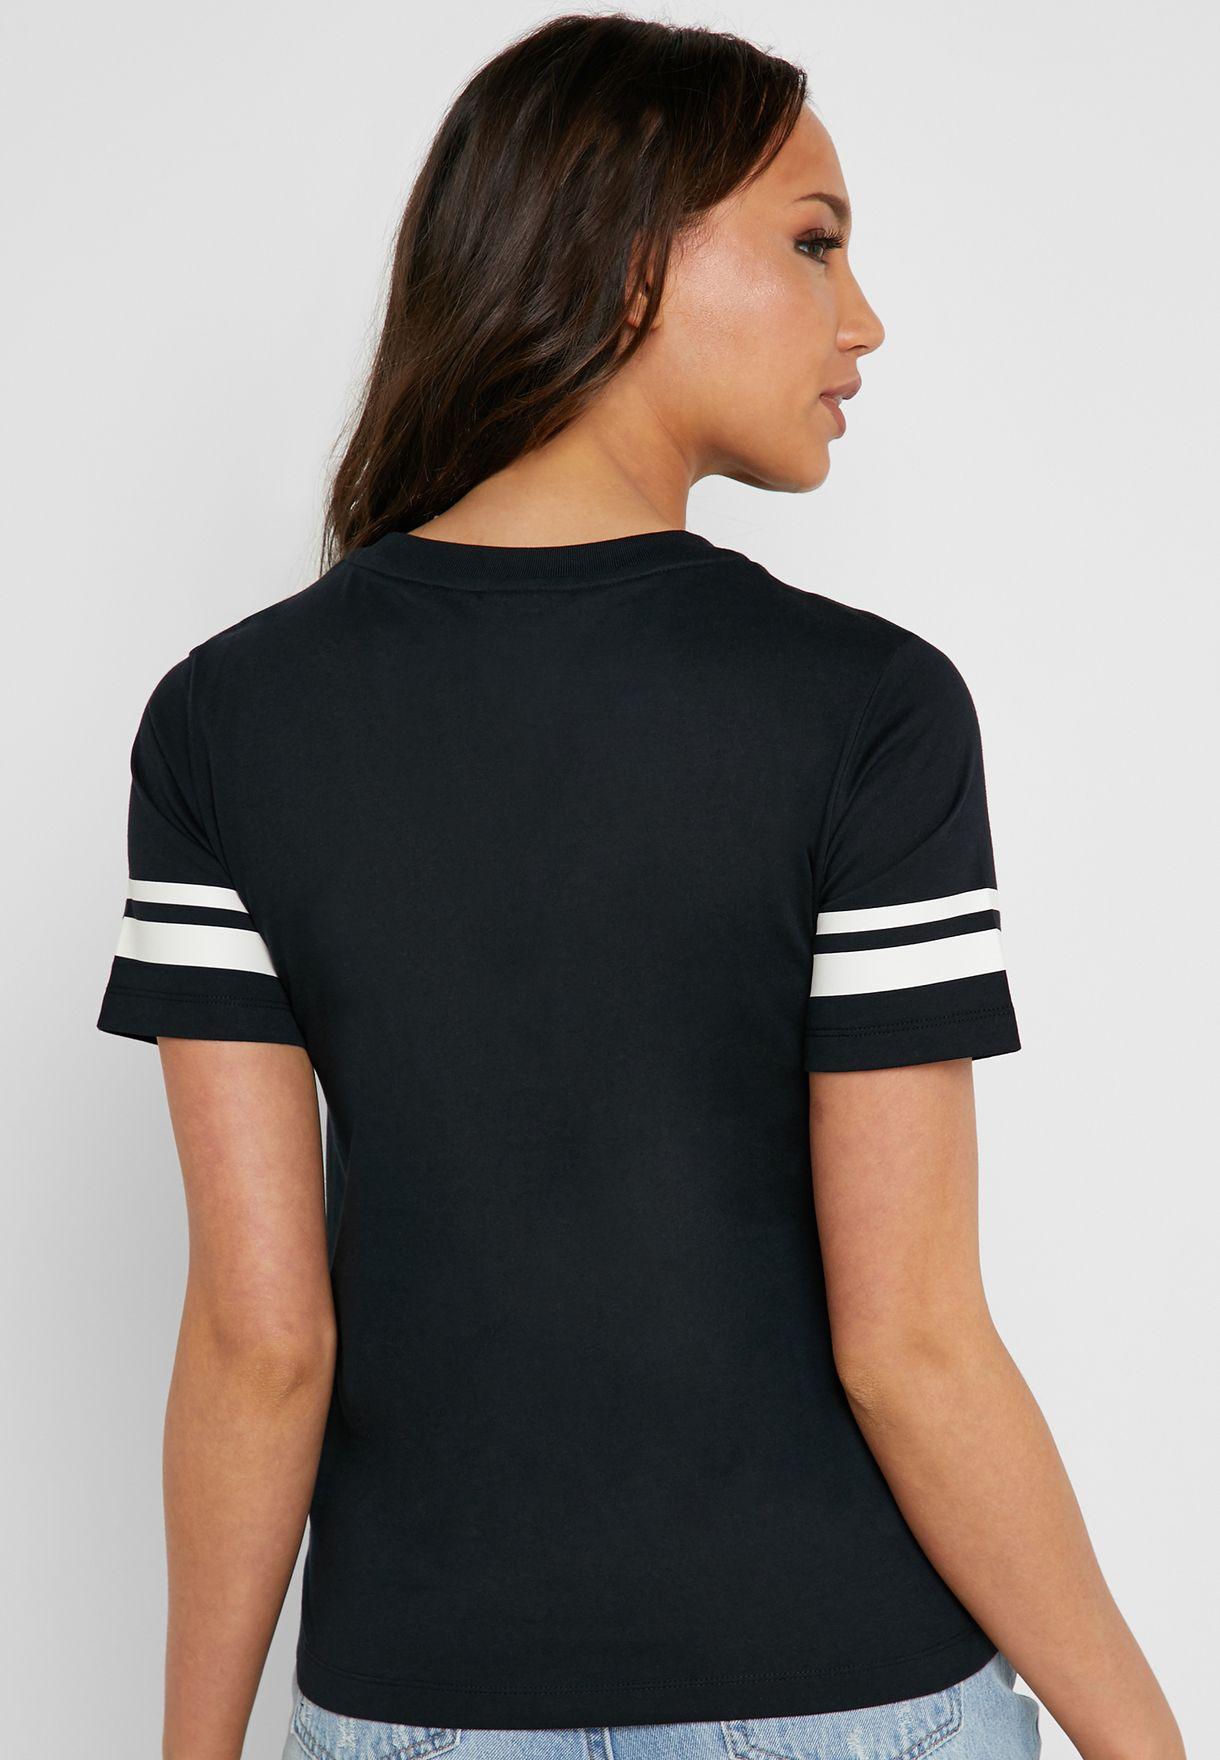 NSW Varsity T-Shirt